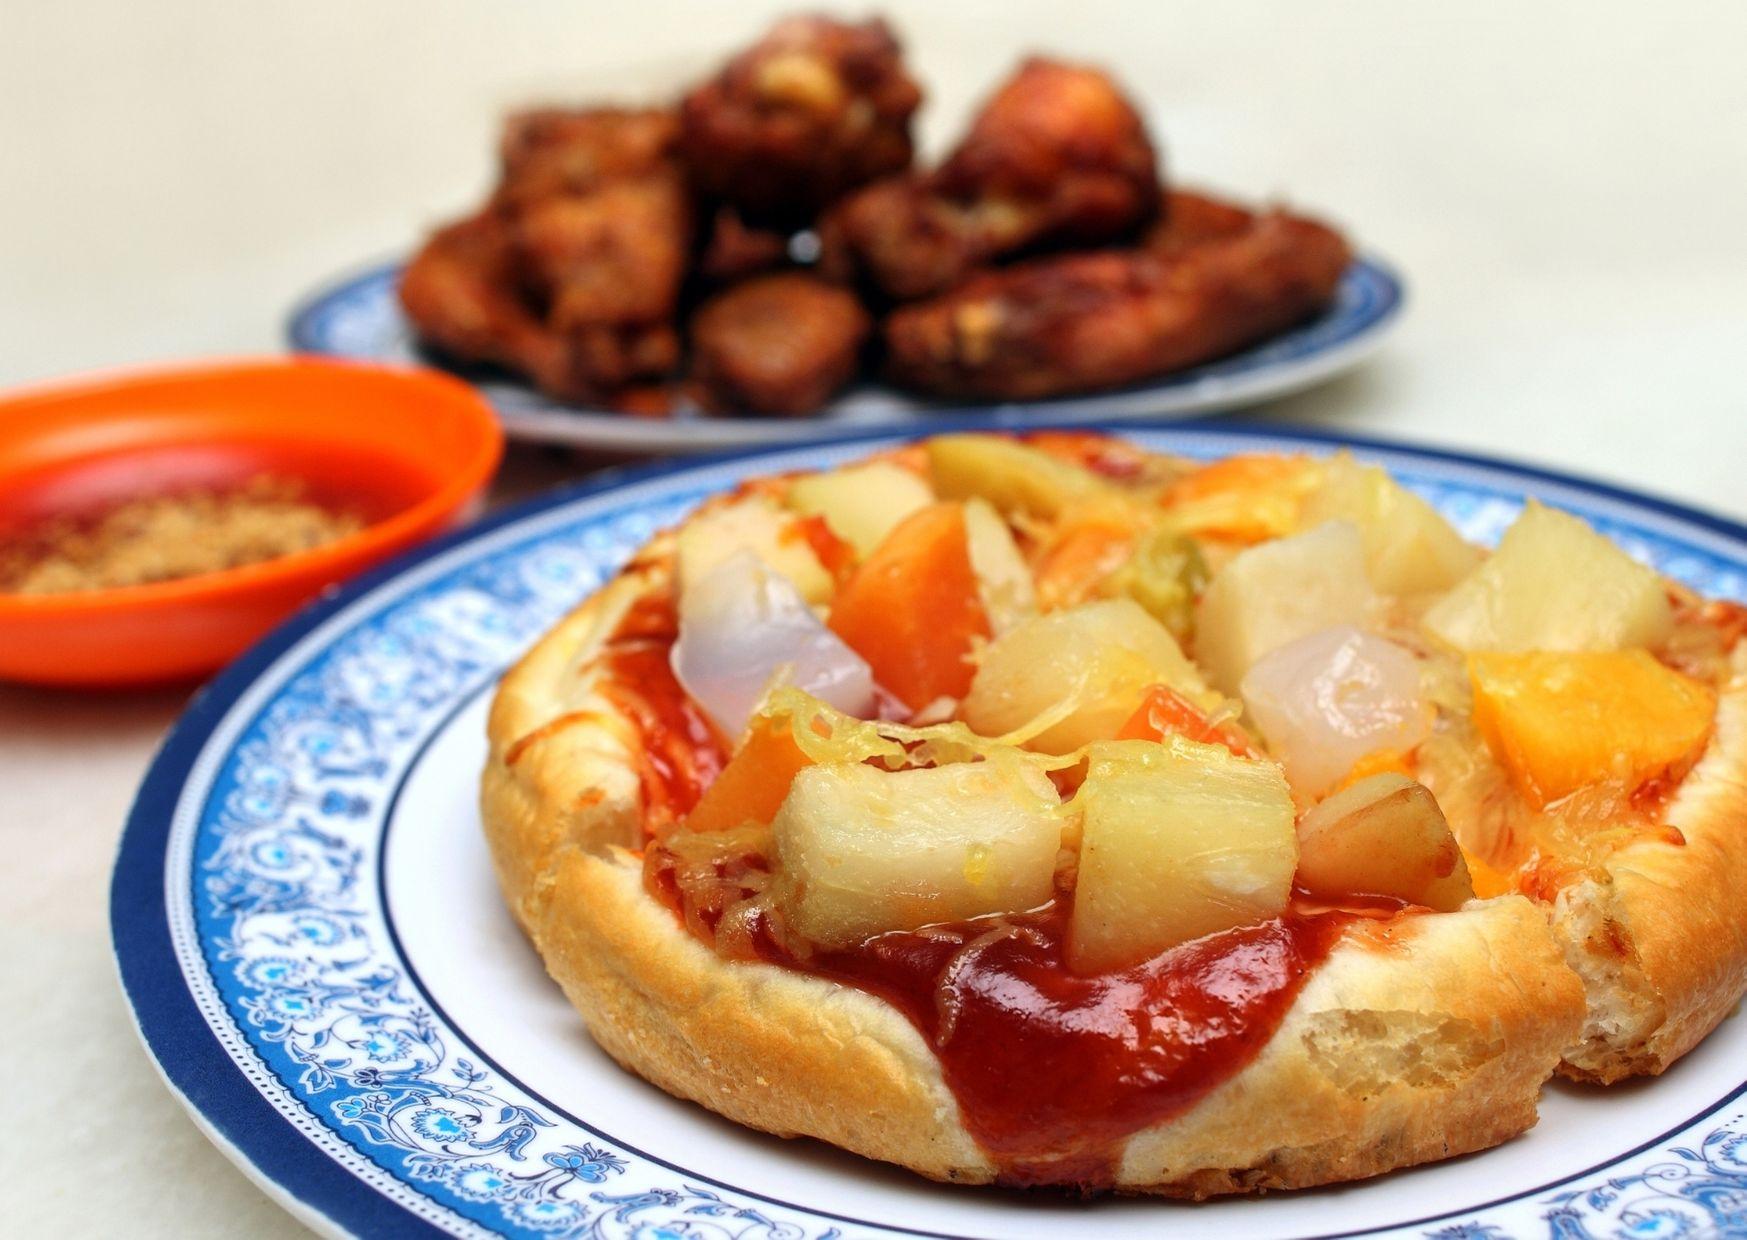 Pizza agridulce de melón y jamón